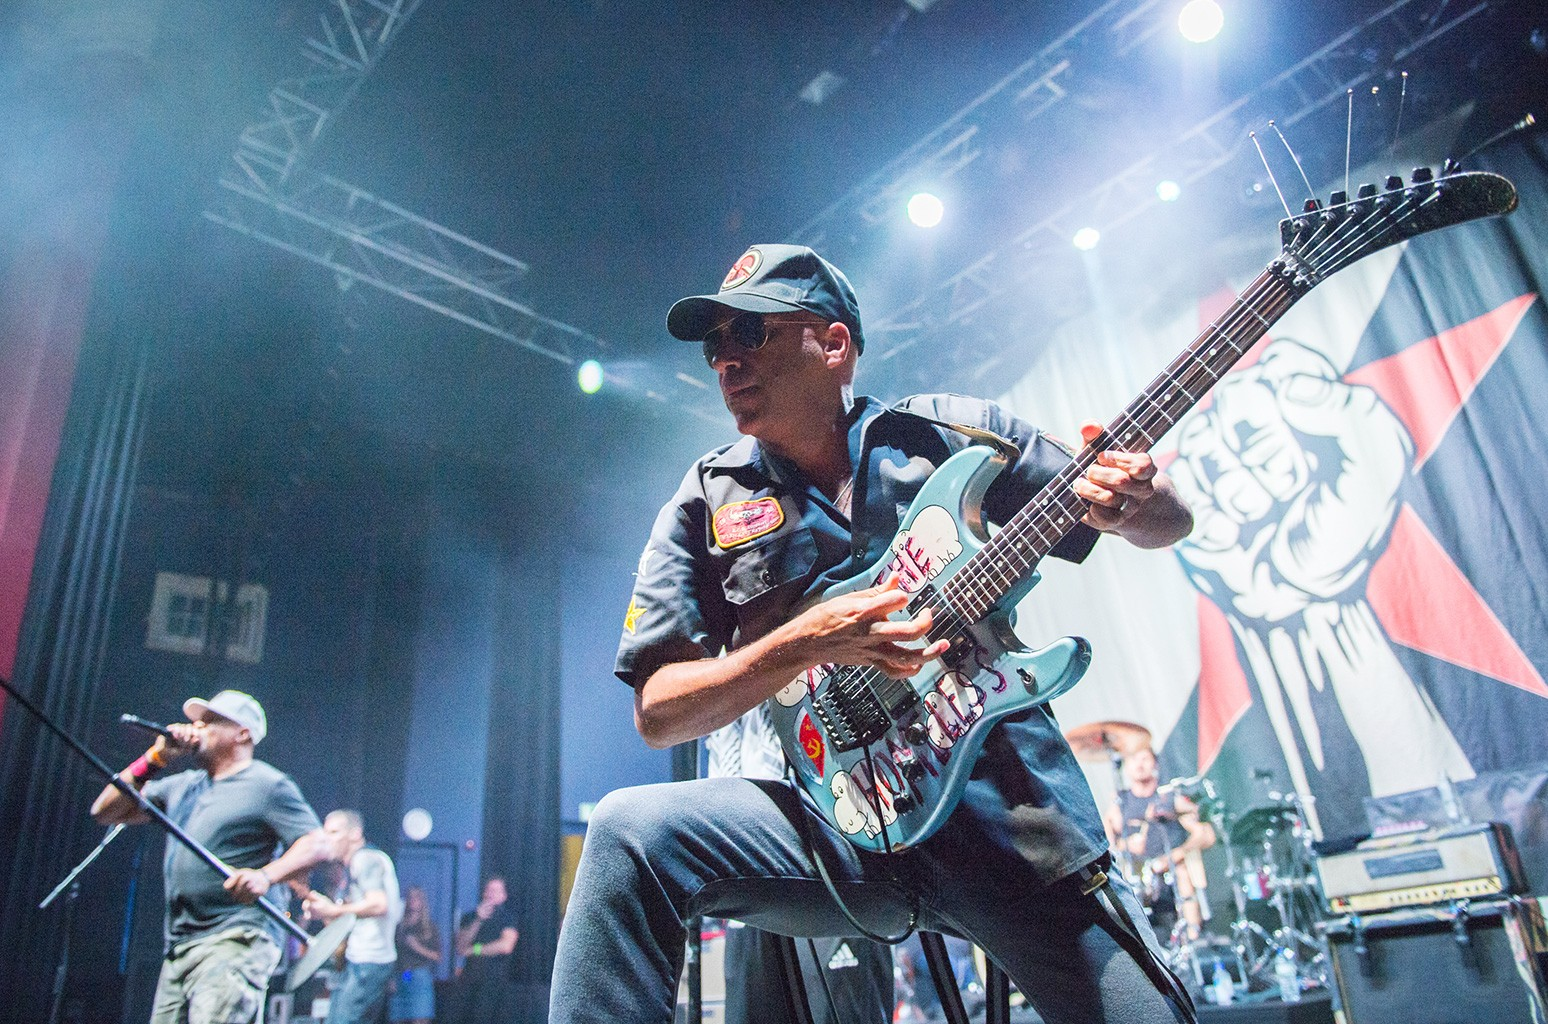 Tom Morello of Rage Against The Machine